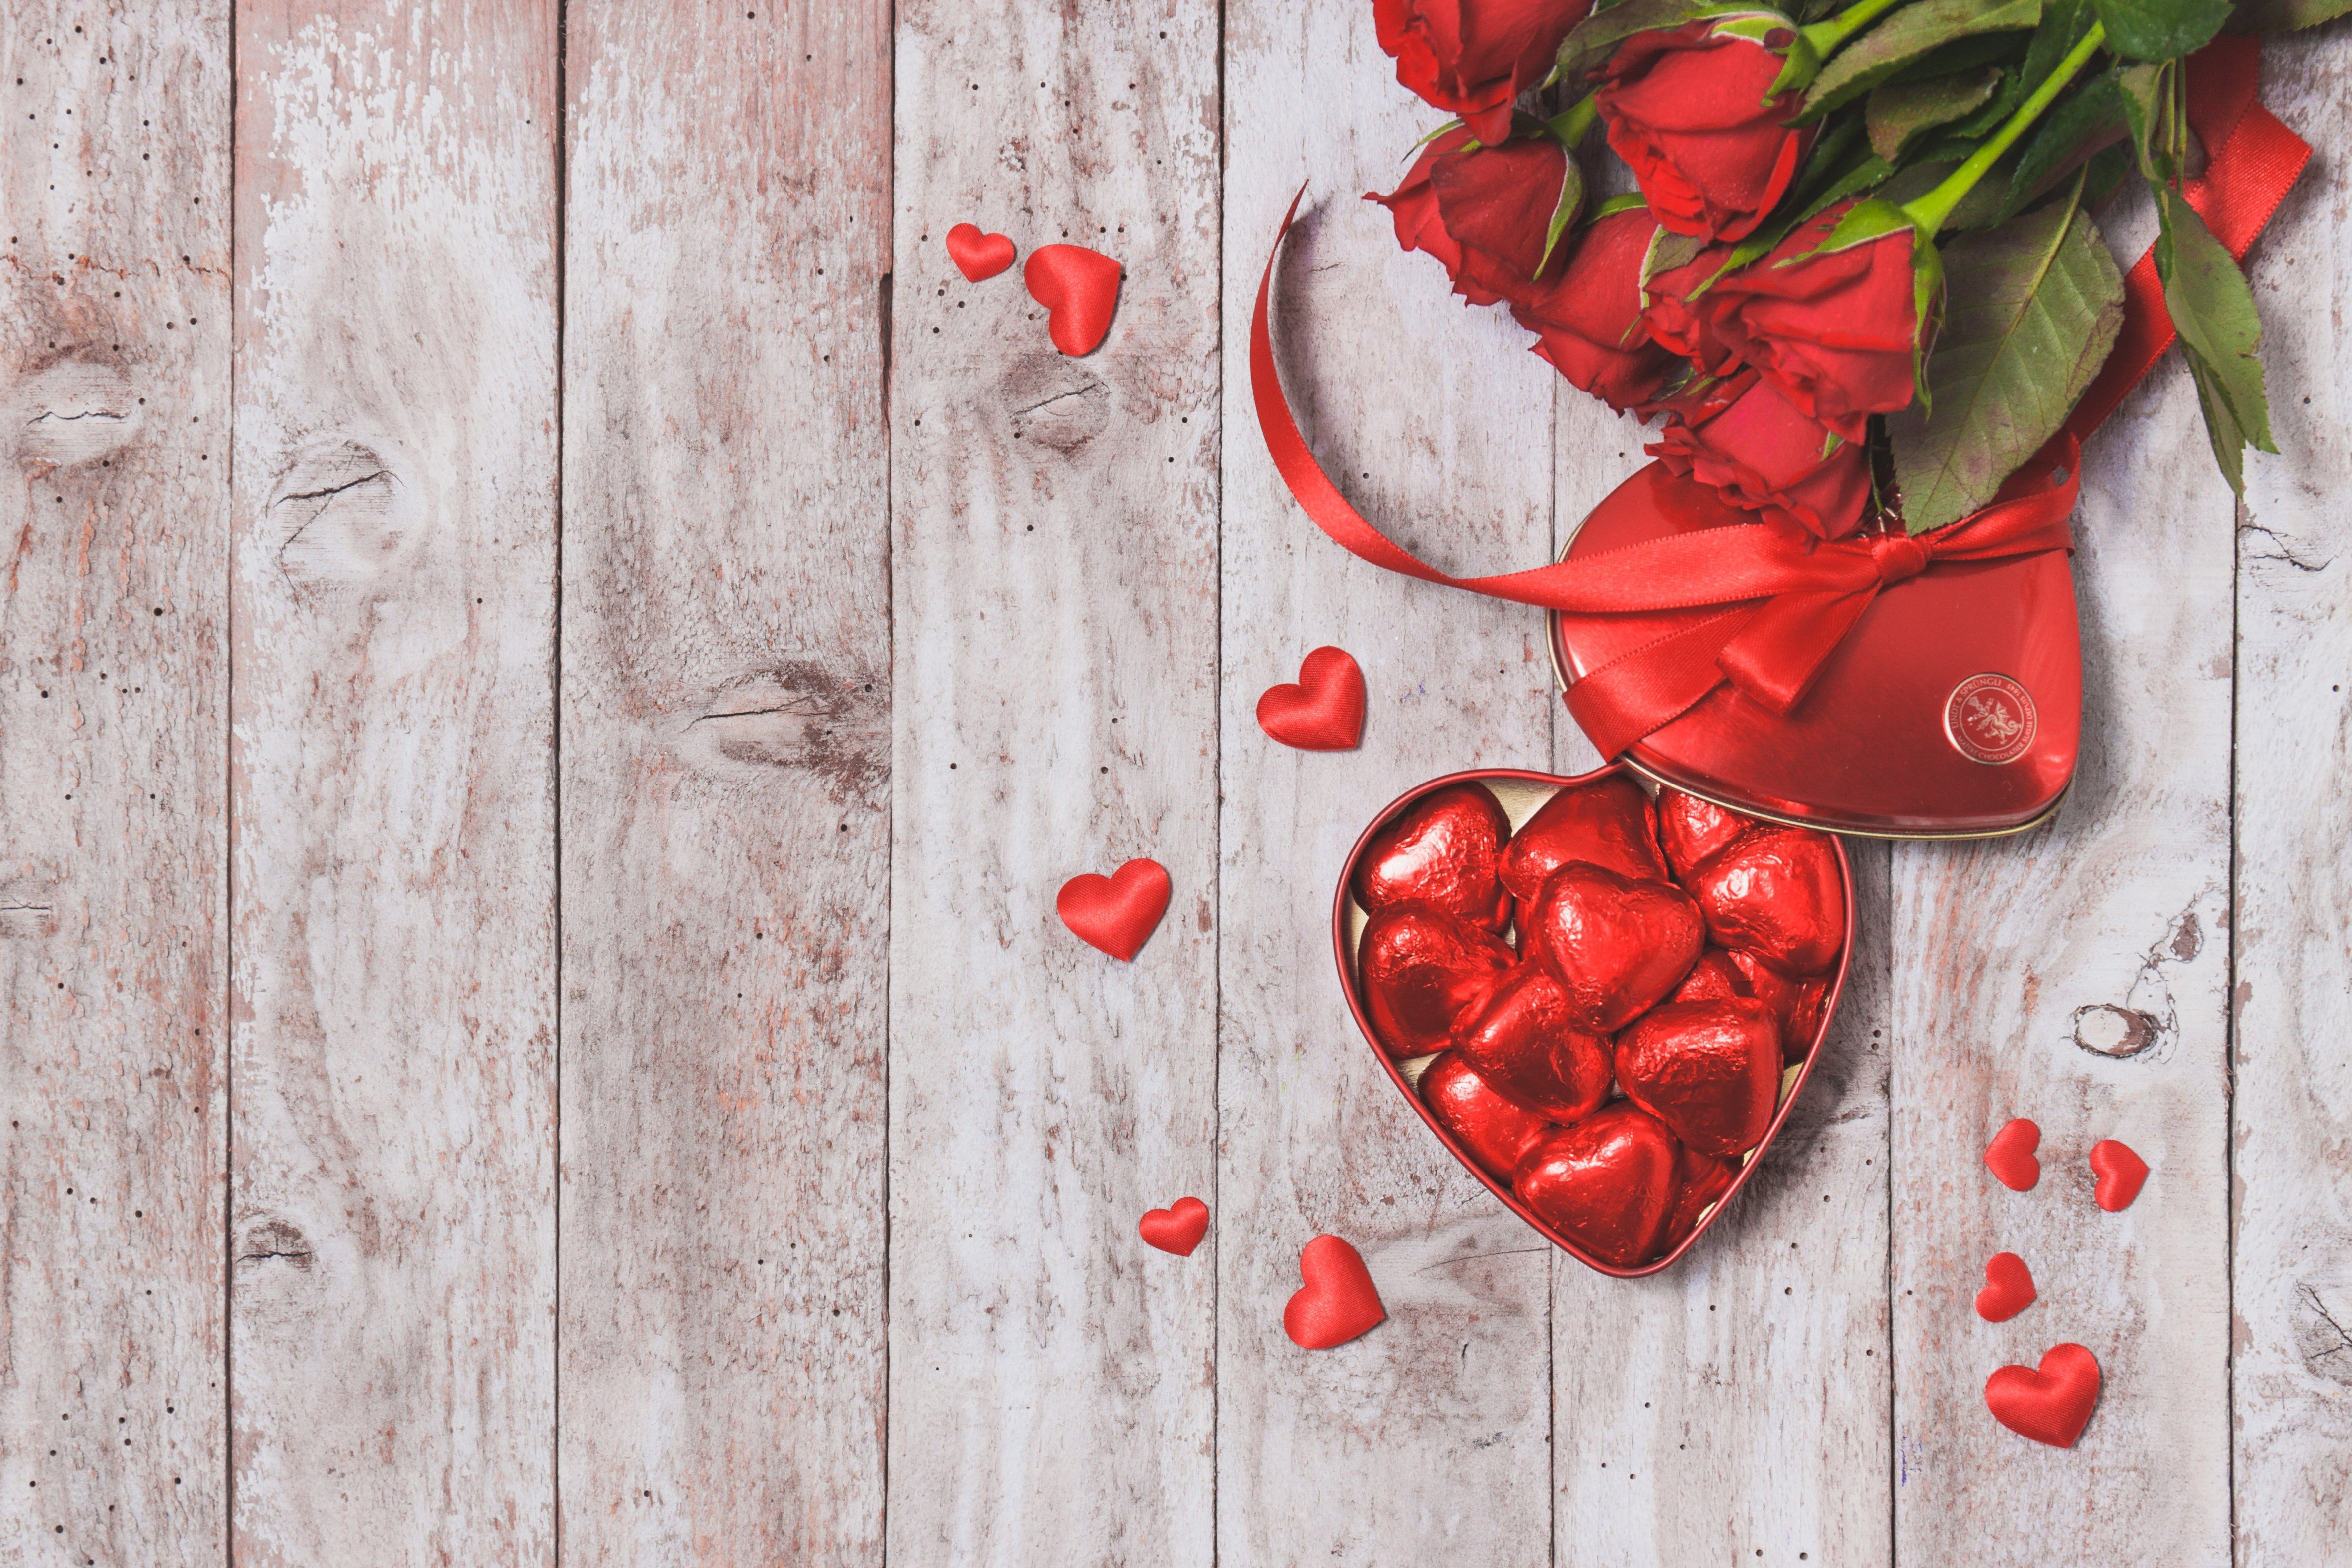 Valentines Day 4k Wallpaper 4740x3160 Desktop Backgrounds